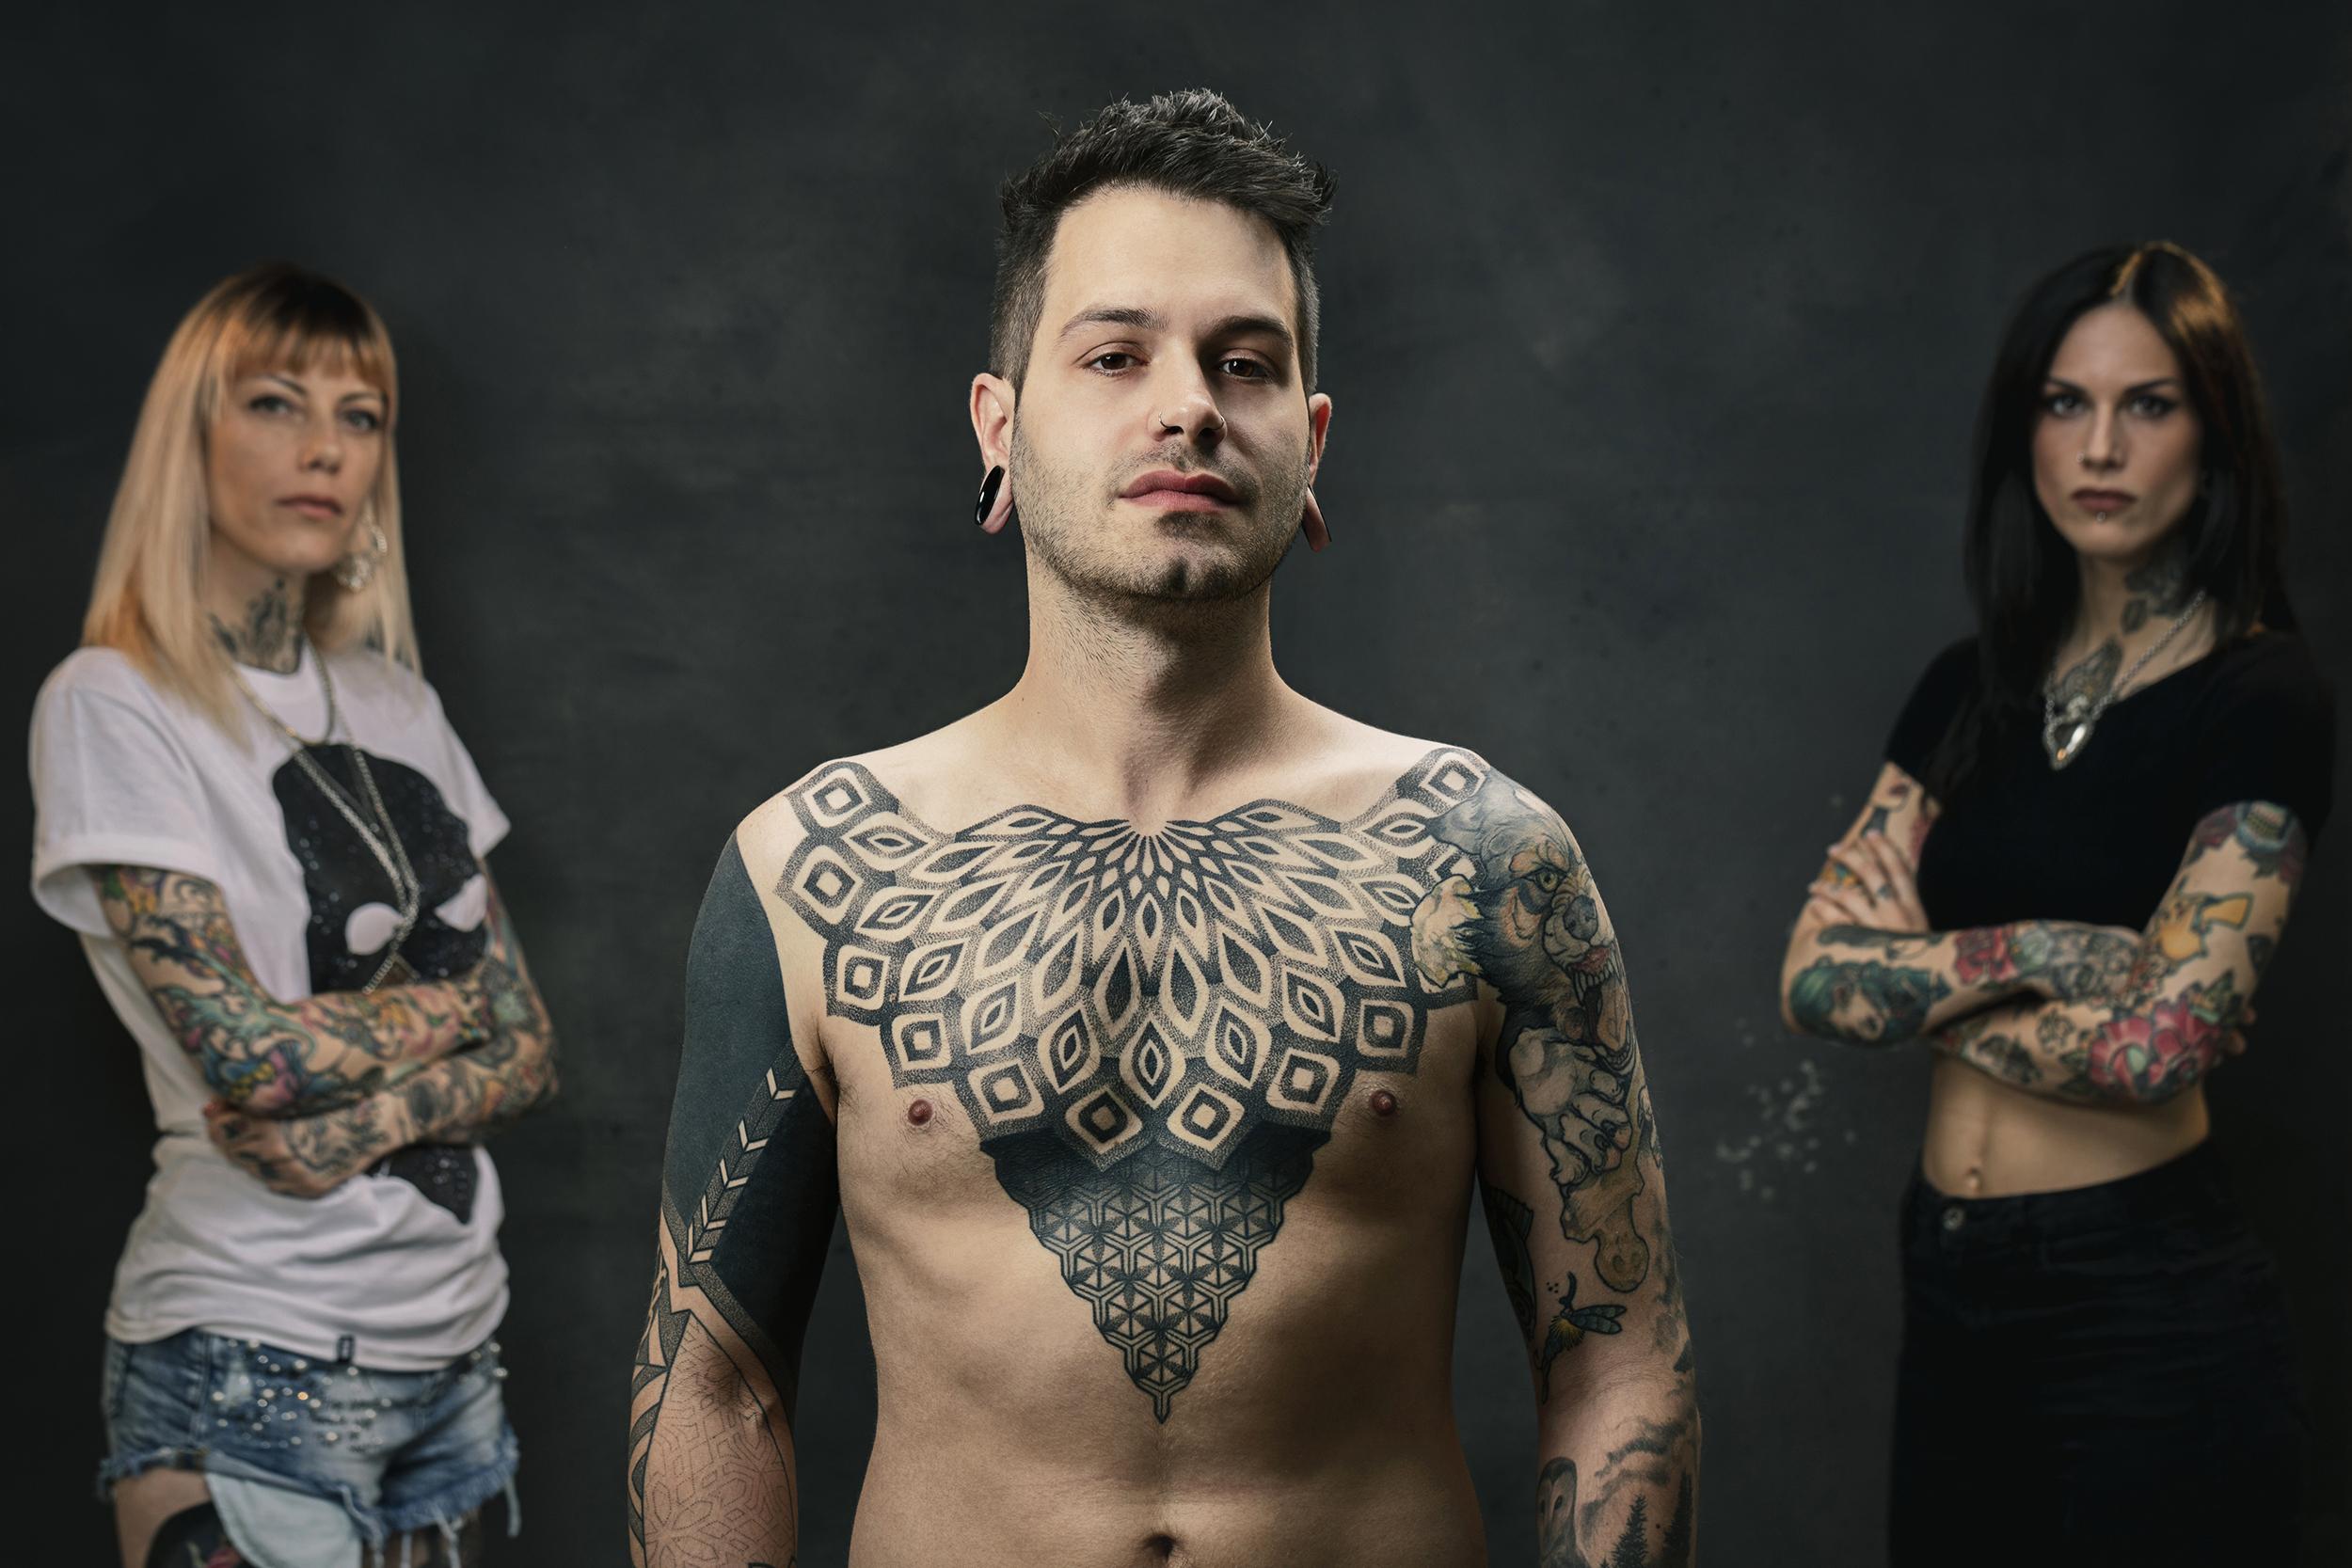 giorgio-leone-institutional-corporate-skin-frame-tattoo-artist-portrait-3.jpg